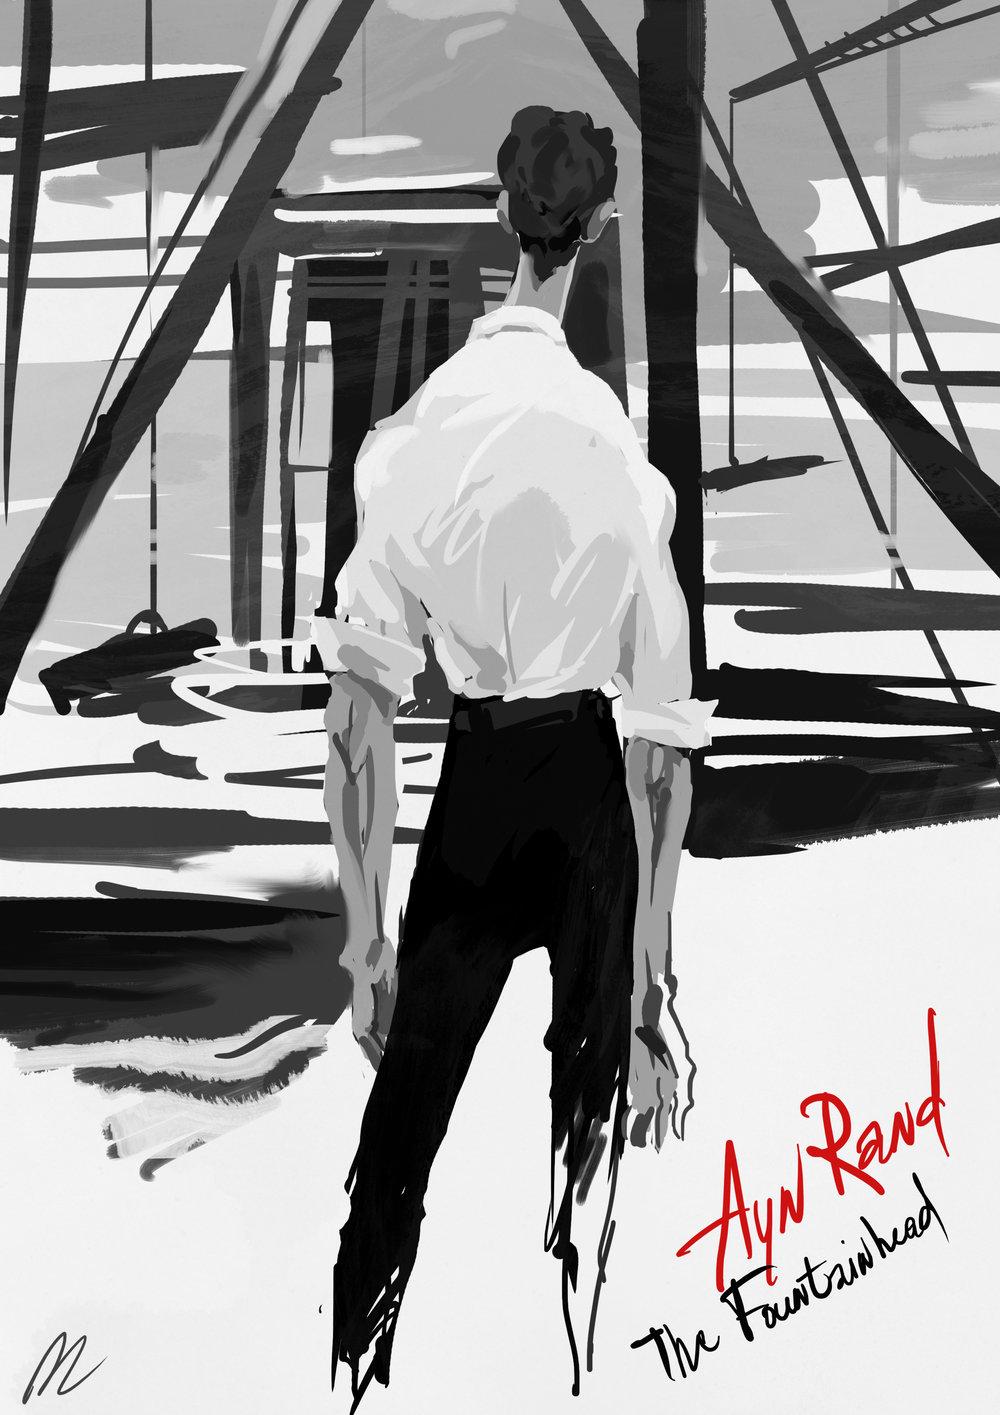 Ayn-Rand-cover.jpg